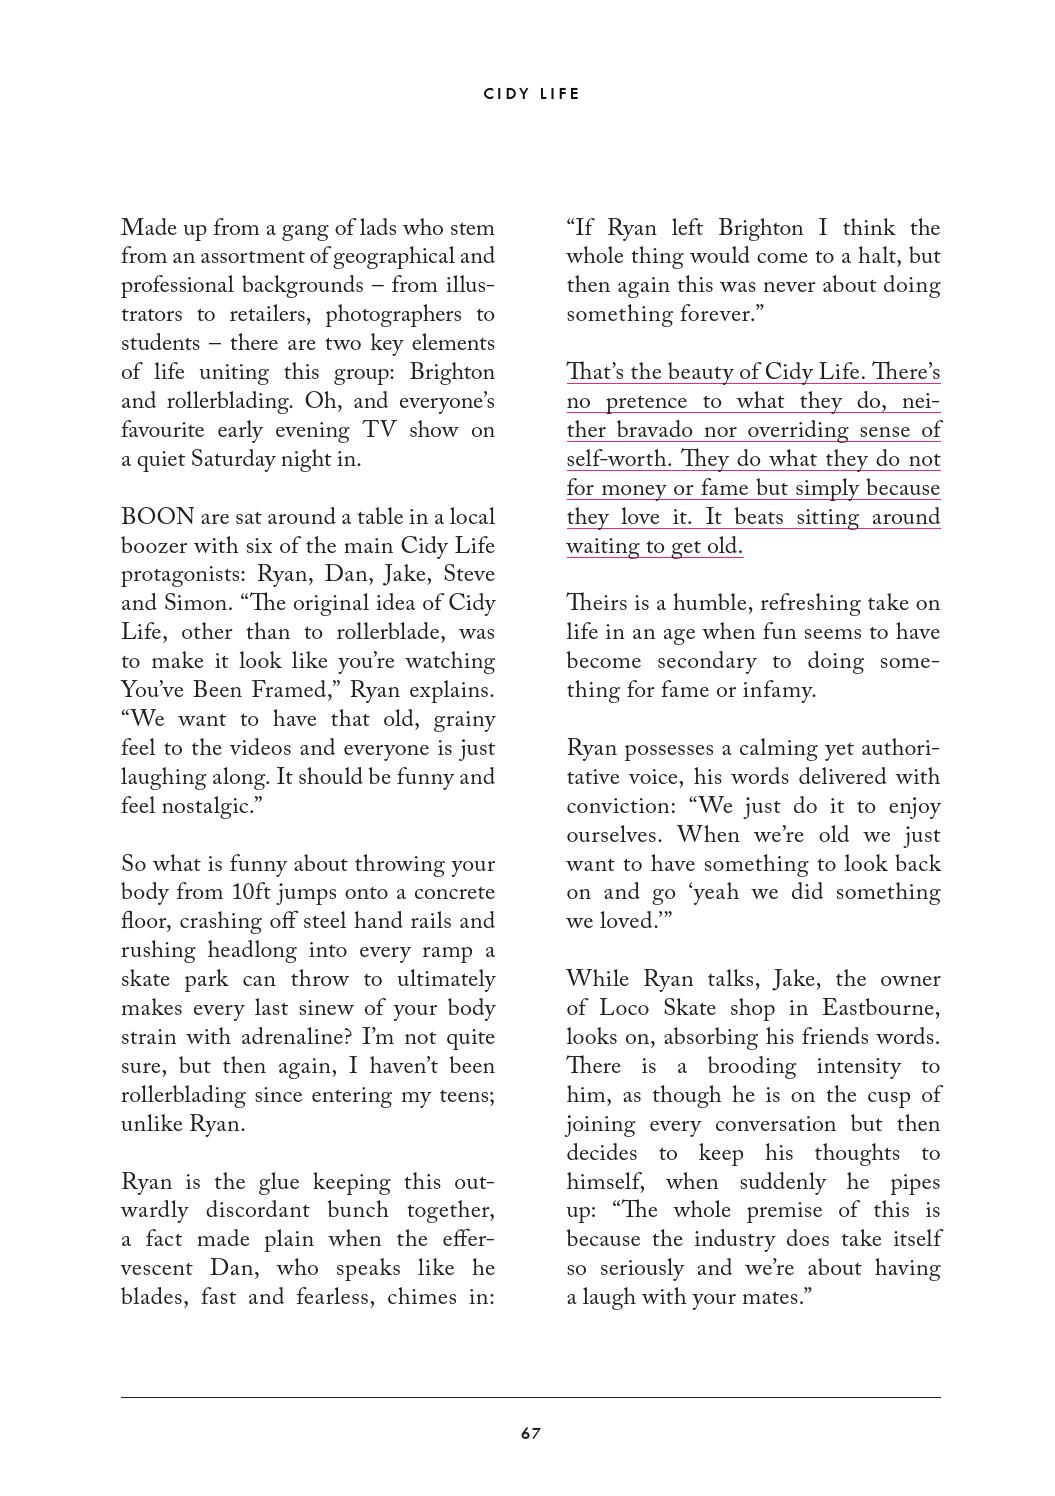 BOON Magazine Issue 3 by BOON Magazine - issuu